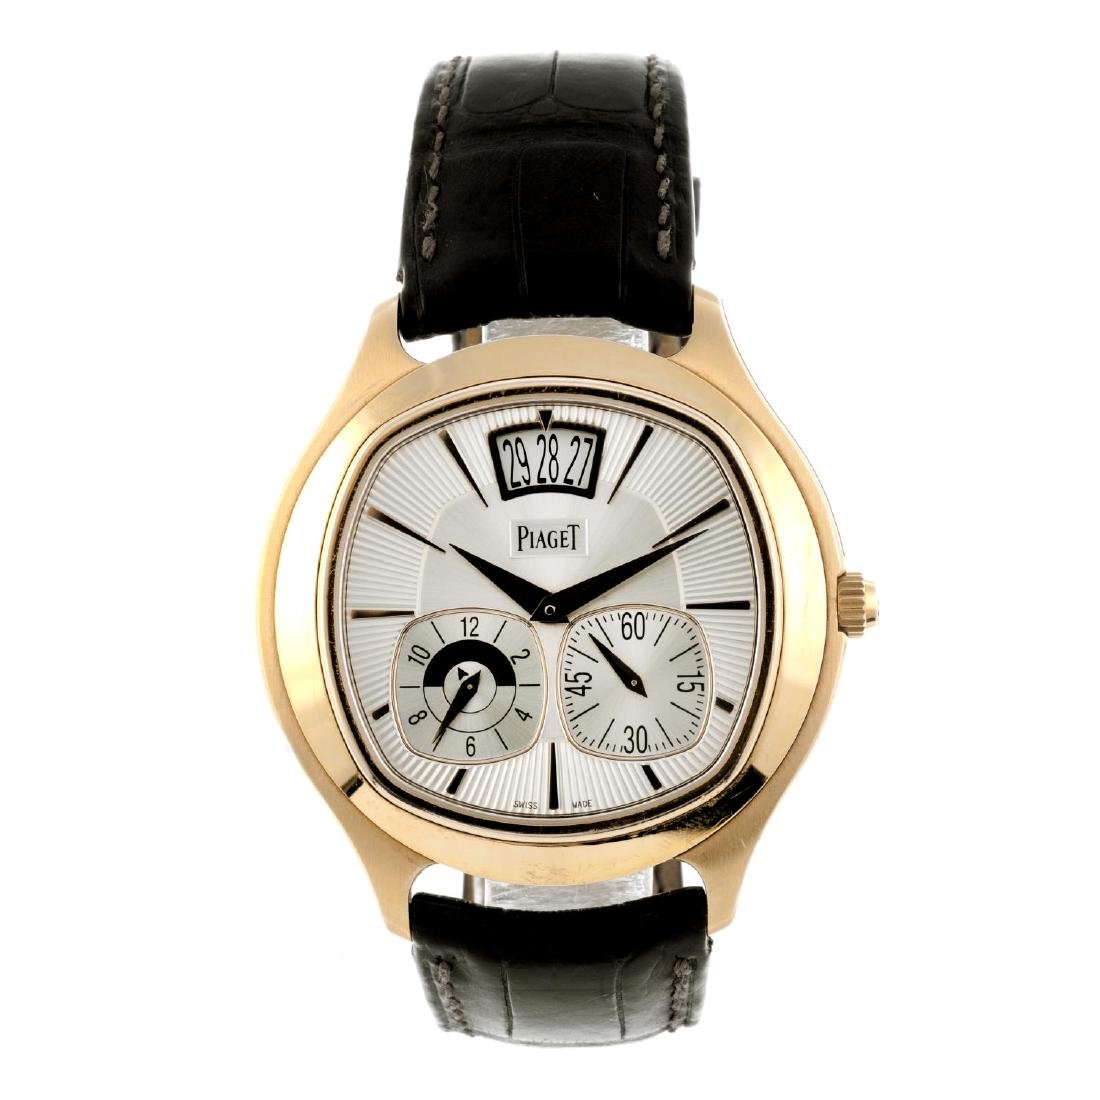 PIAGET - a limited edition gentleman's Emperador wrist